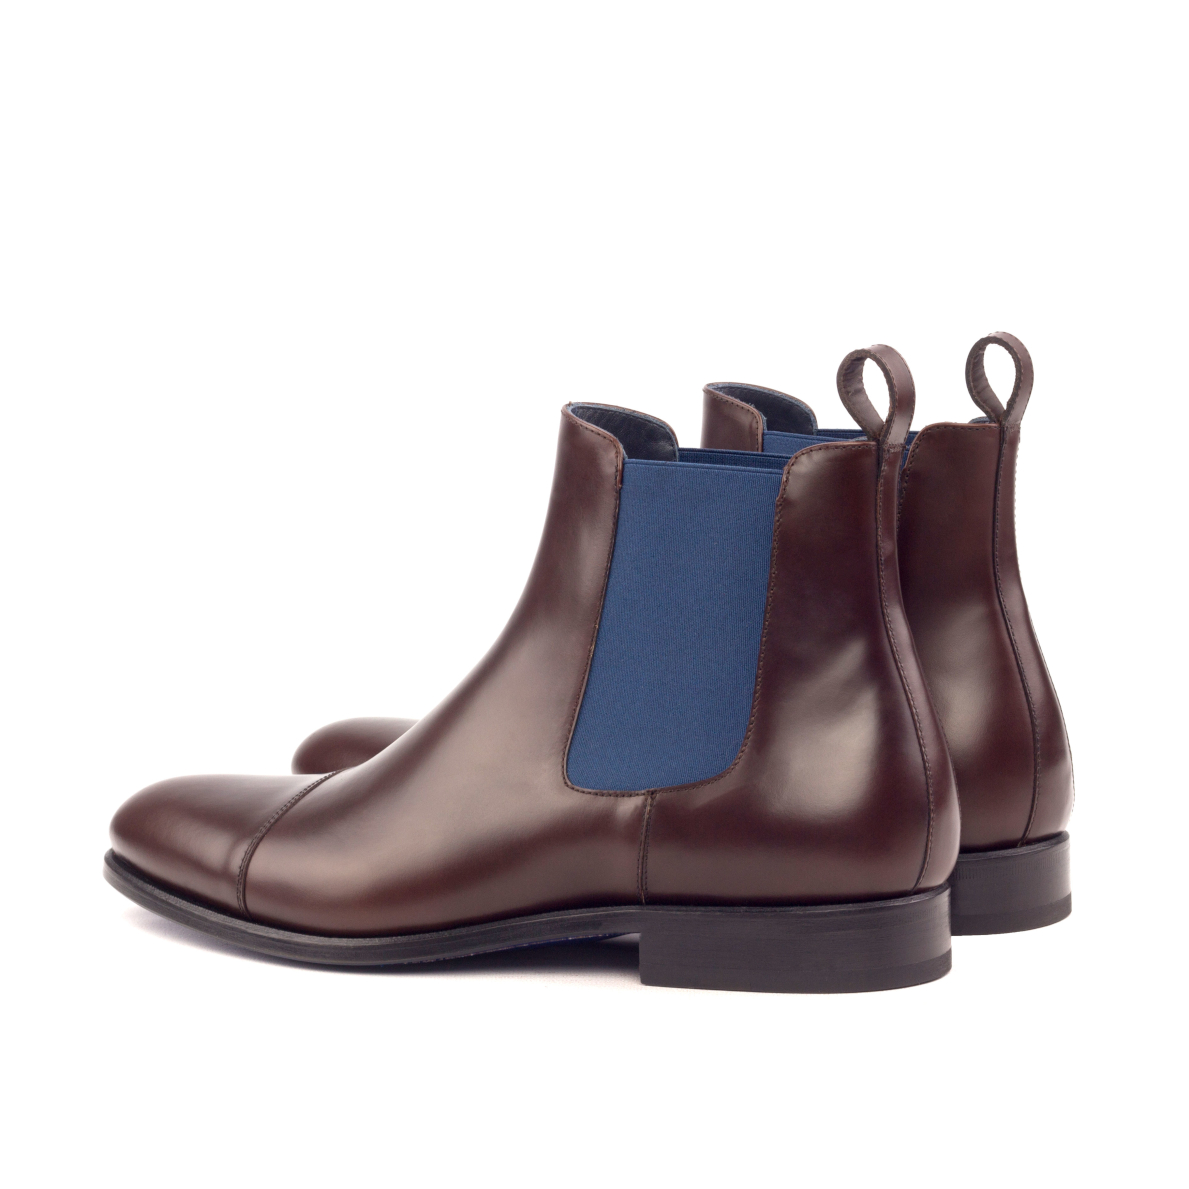 Burgundy box calf Chelsea boot